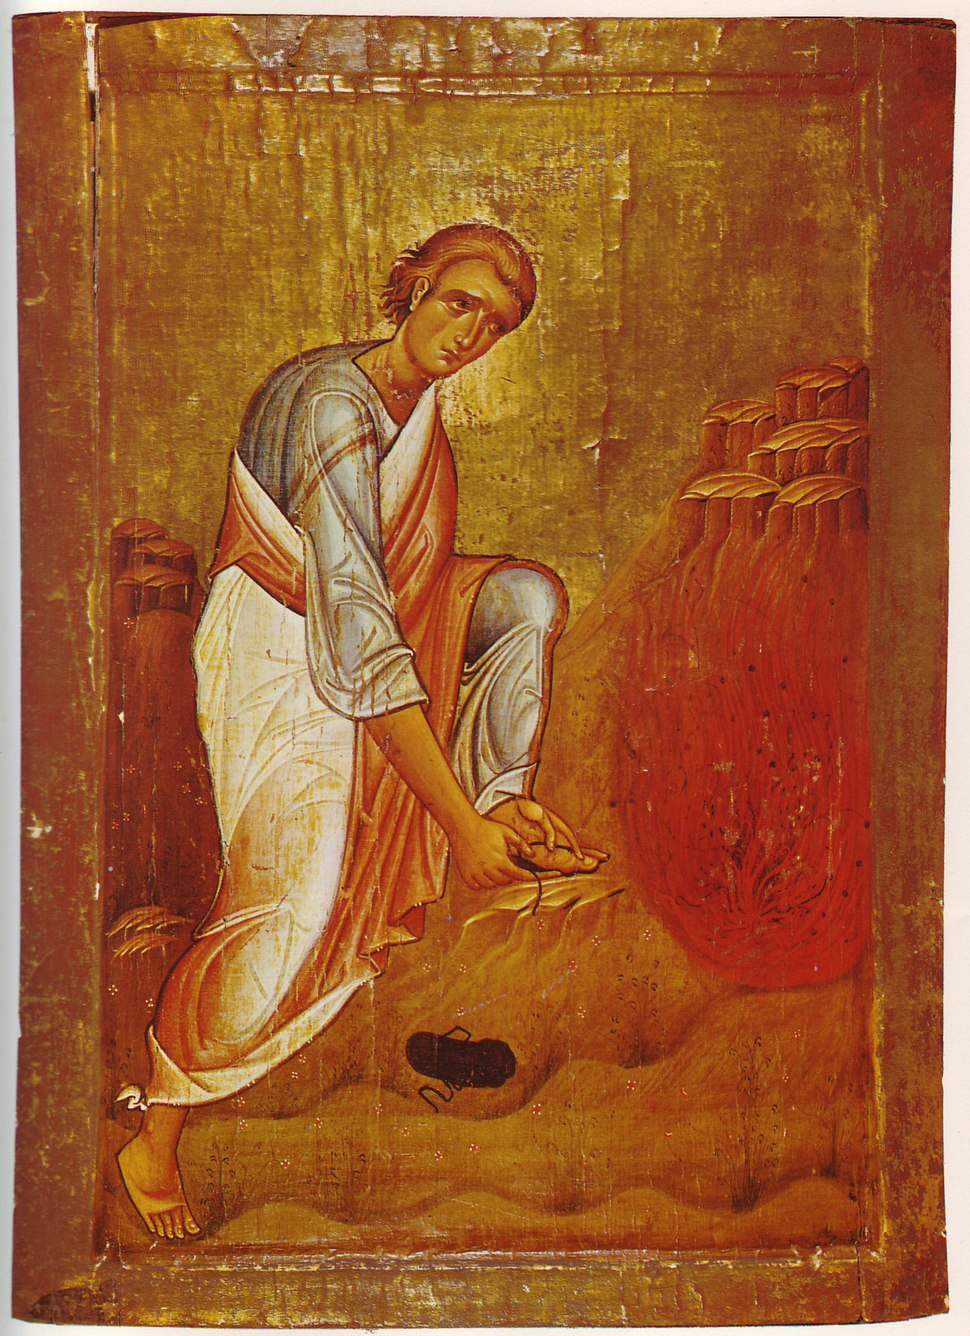 Moses & Bush Icon Sinai c12th century